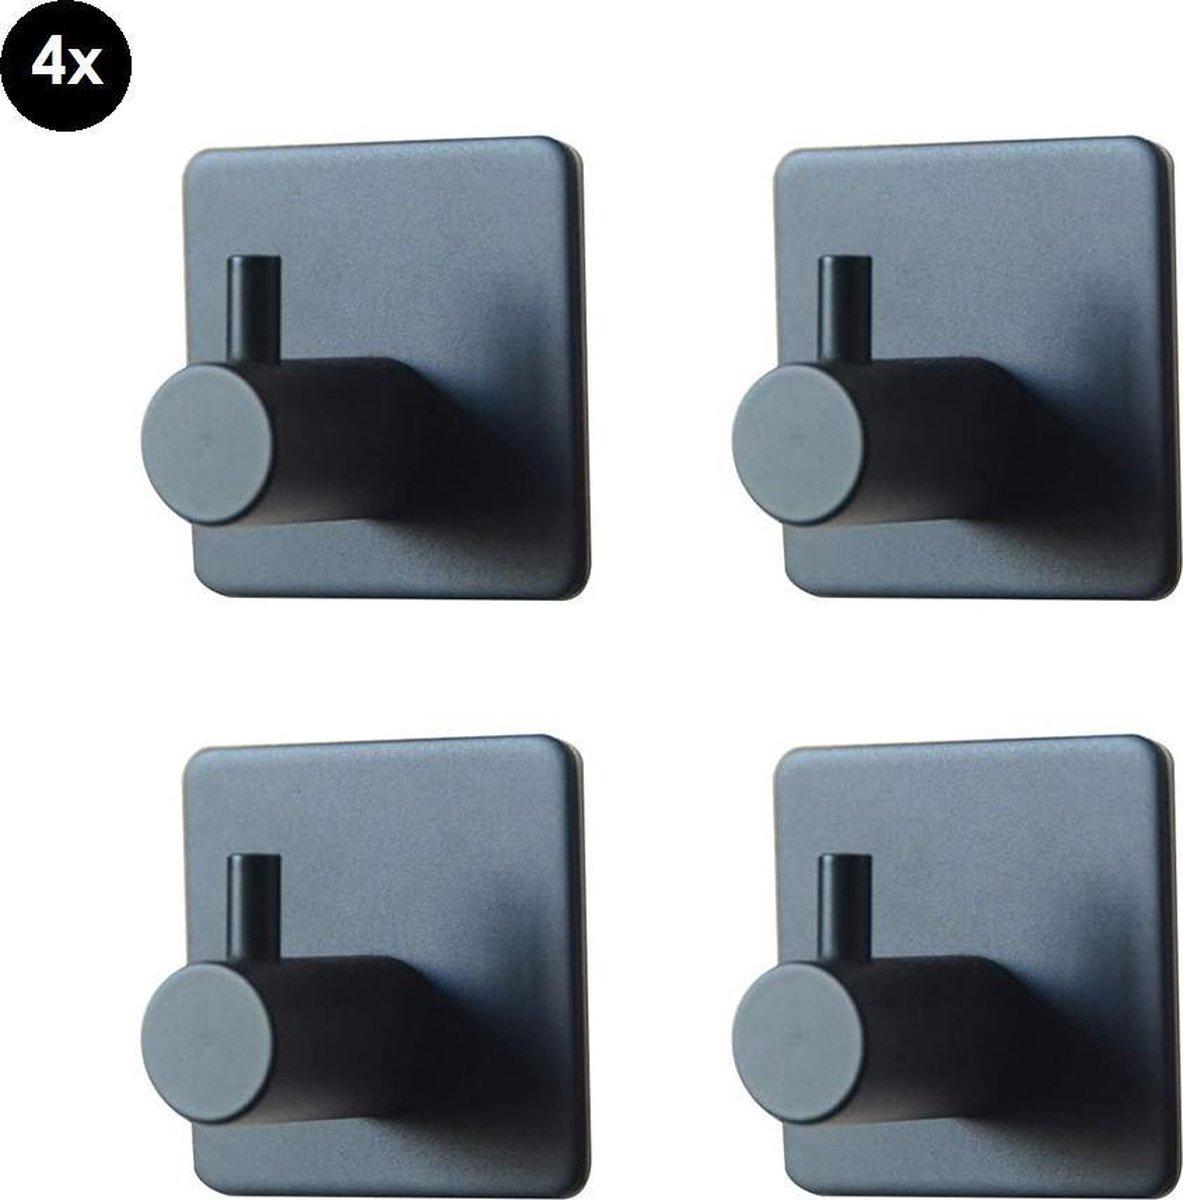 Handdoekhaakje Zwart - Wandhaakje - Luxe - Zelfklevend - Vierkant - Multifunctioneel